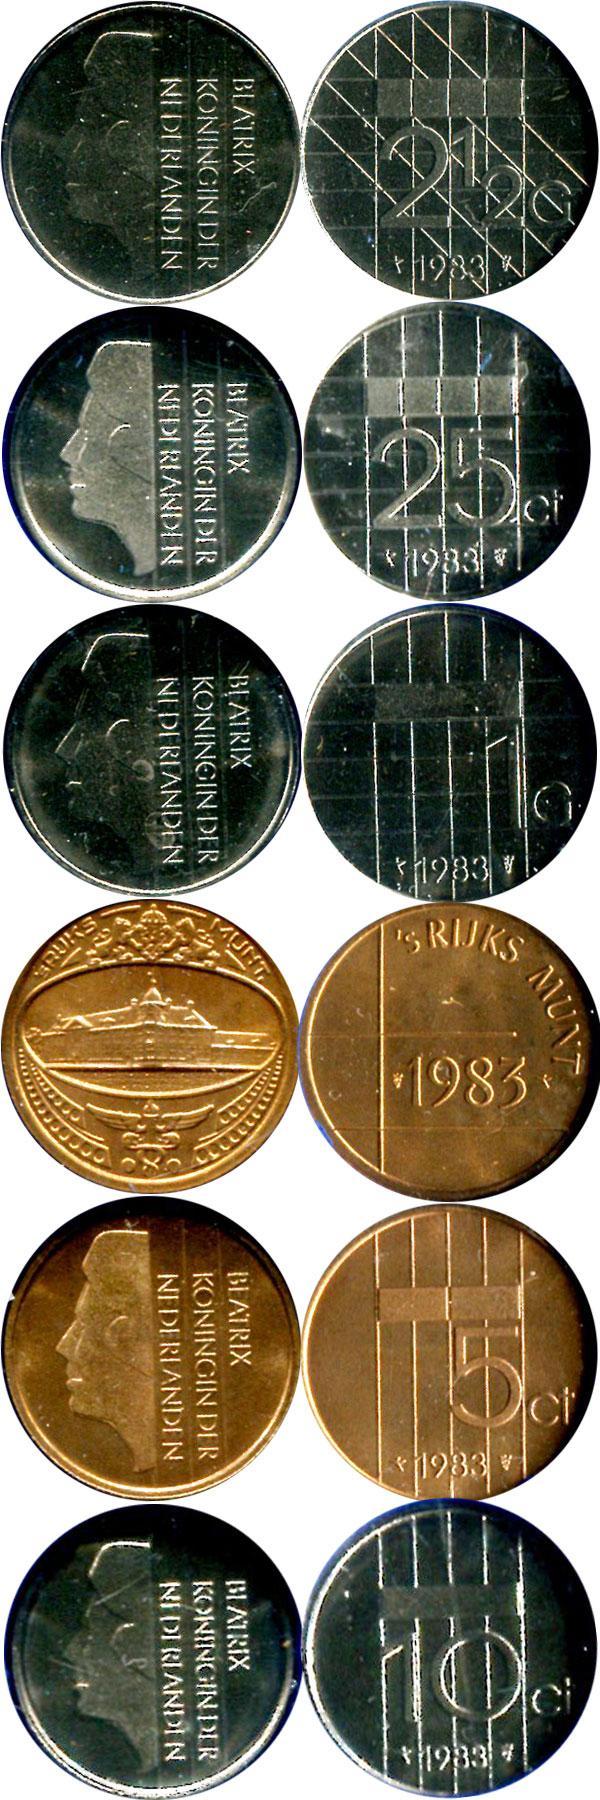 Каталог монет - Нидерланды Набор монет 1983 года